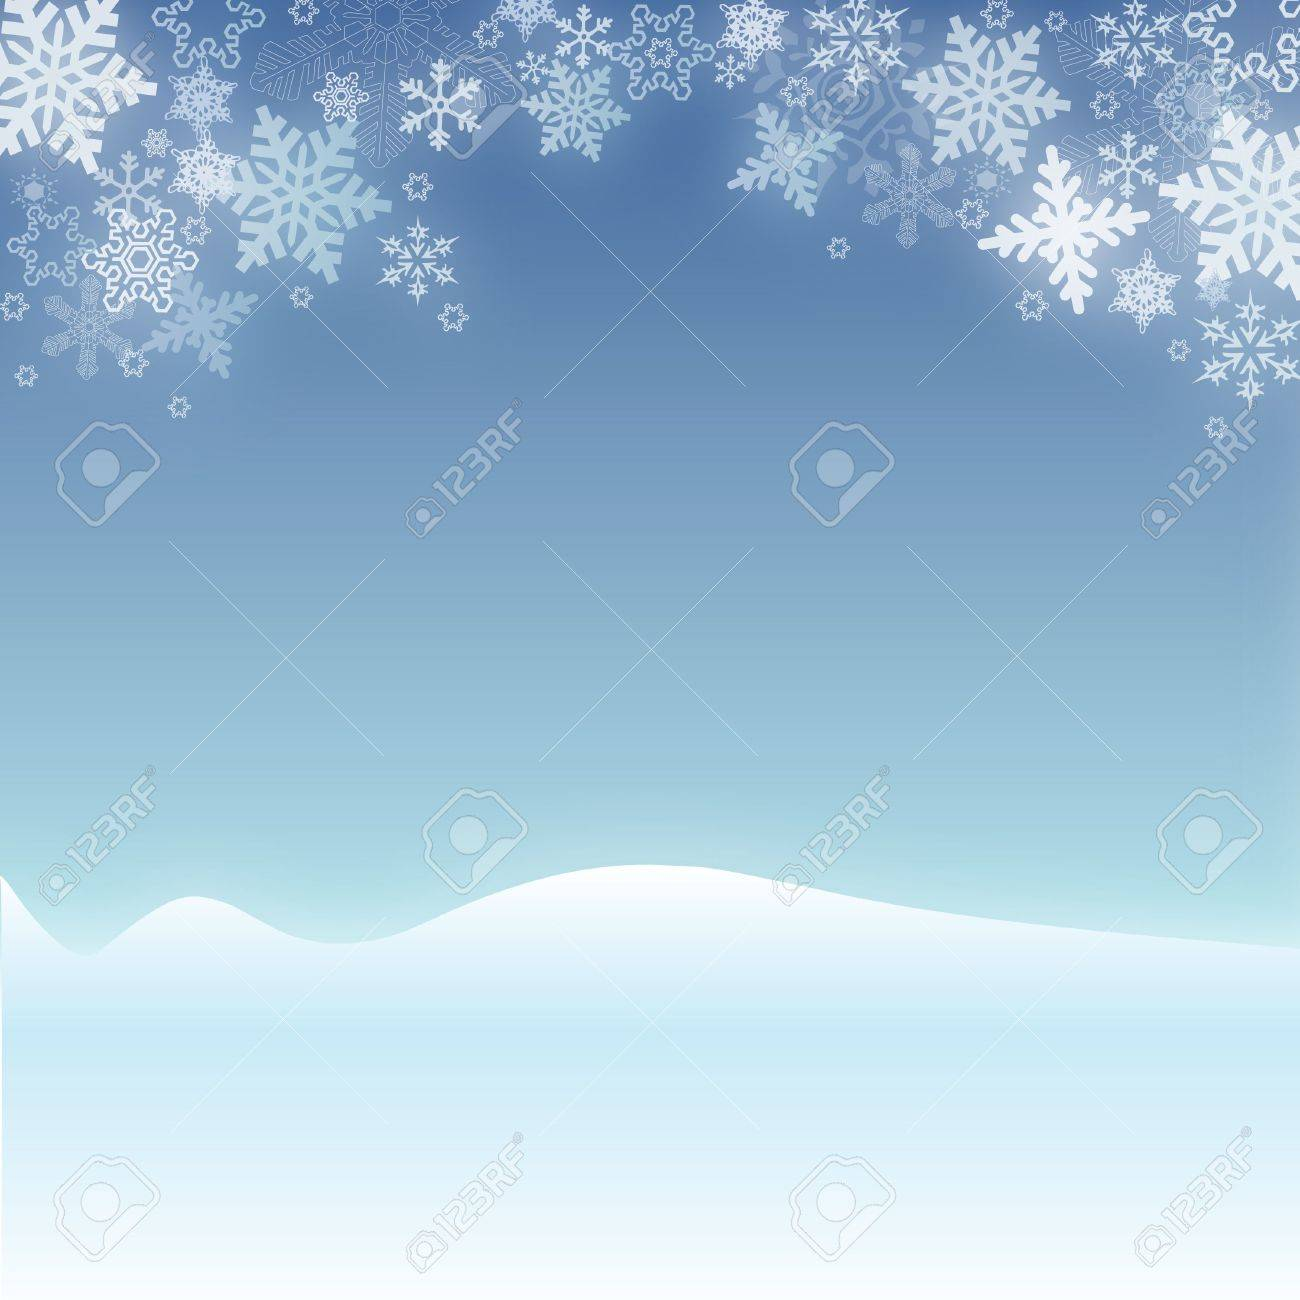 Snowy Christmas Winter Scene Stock Photo - 2068167